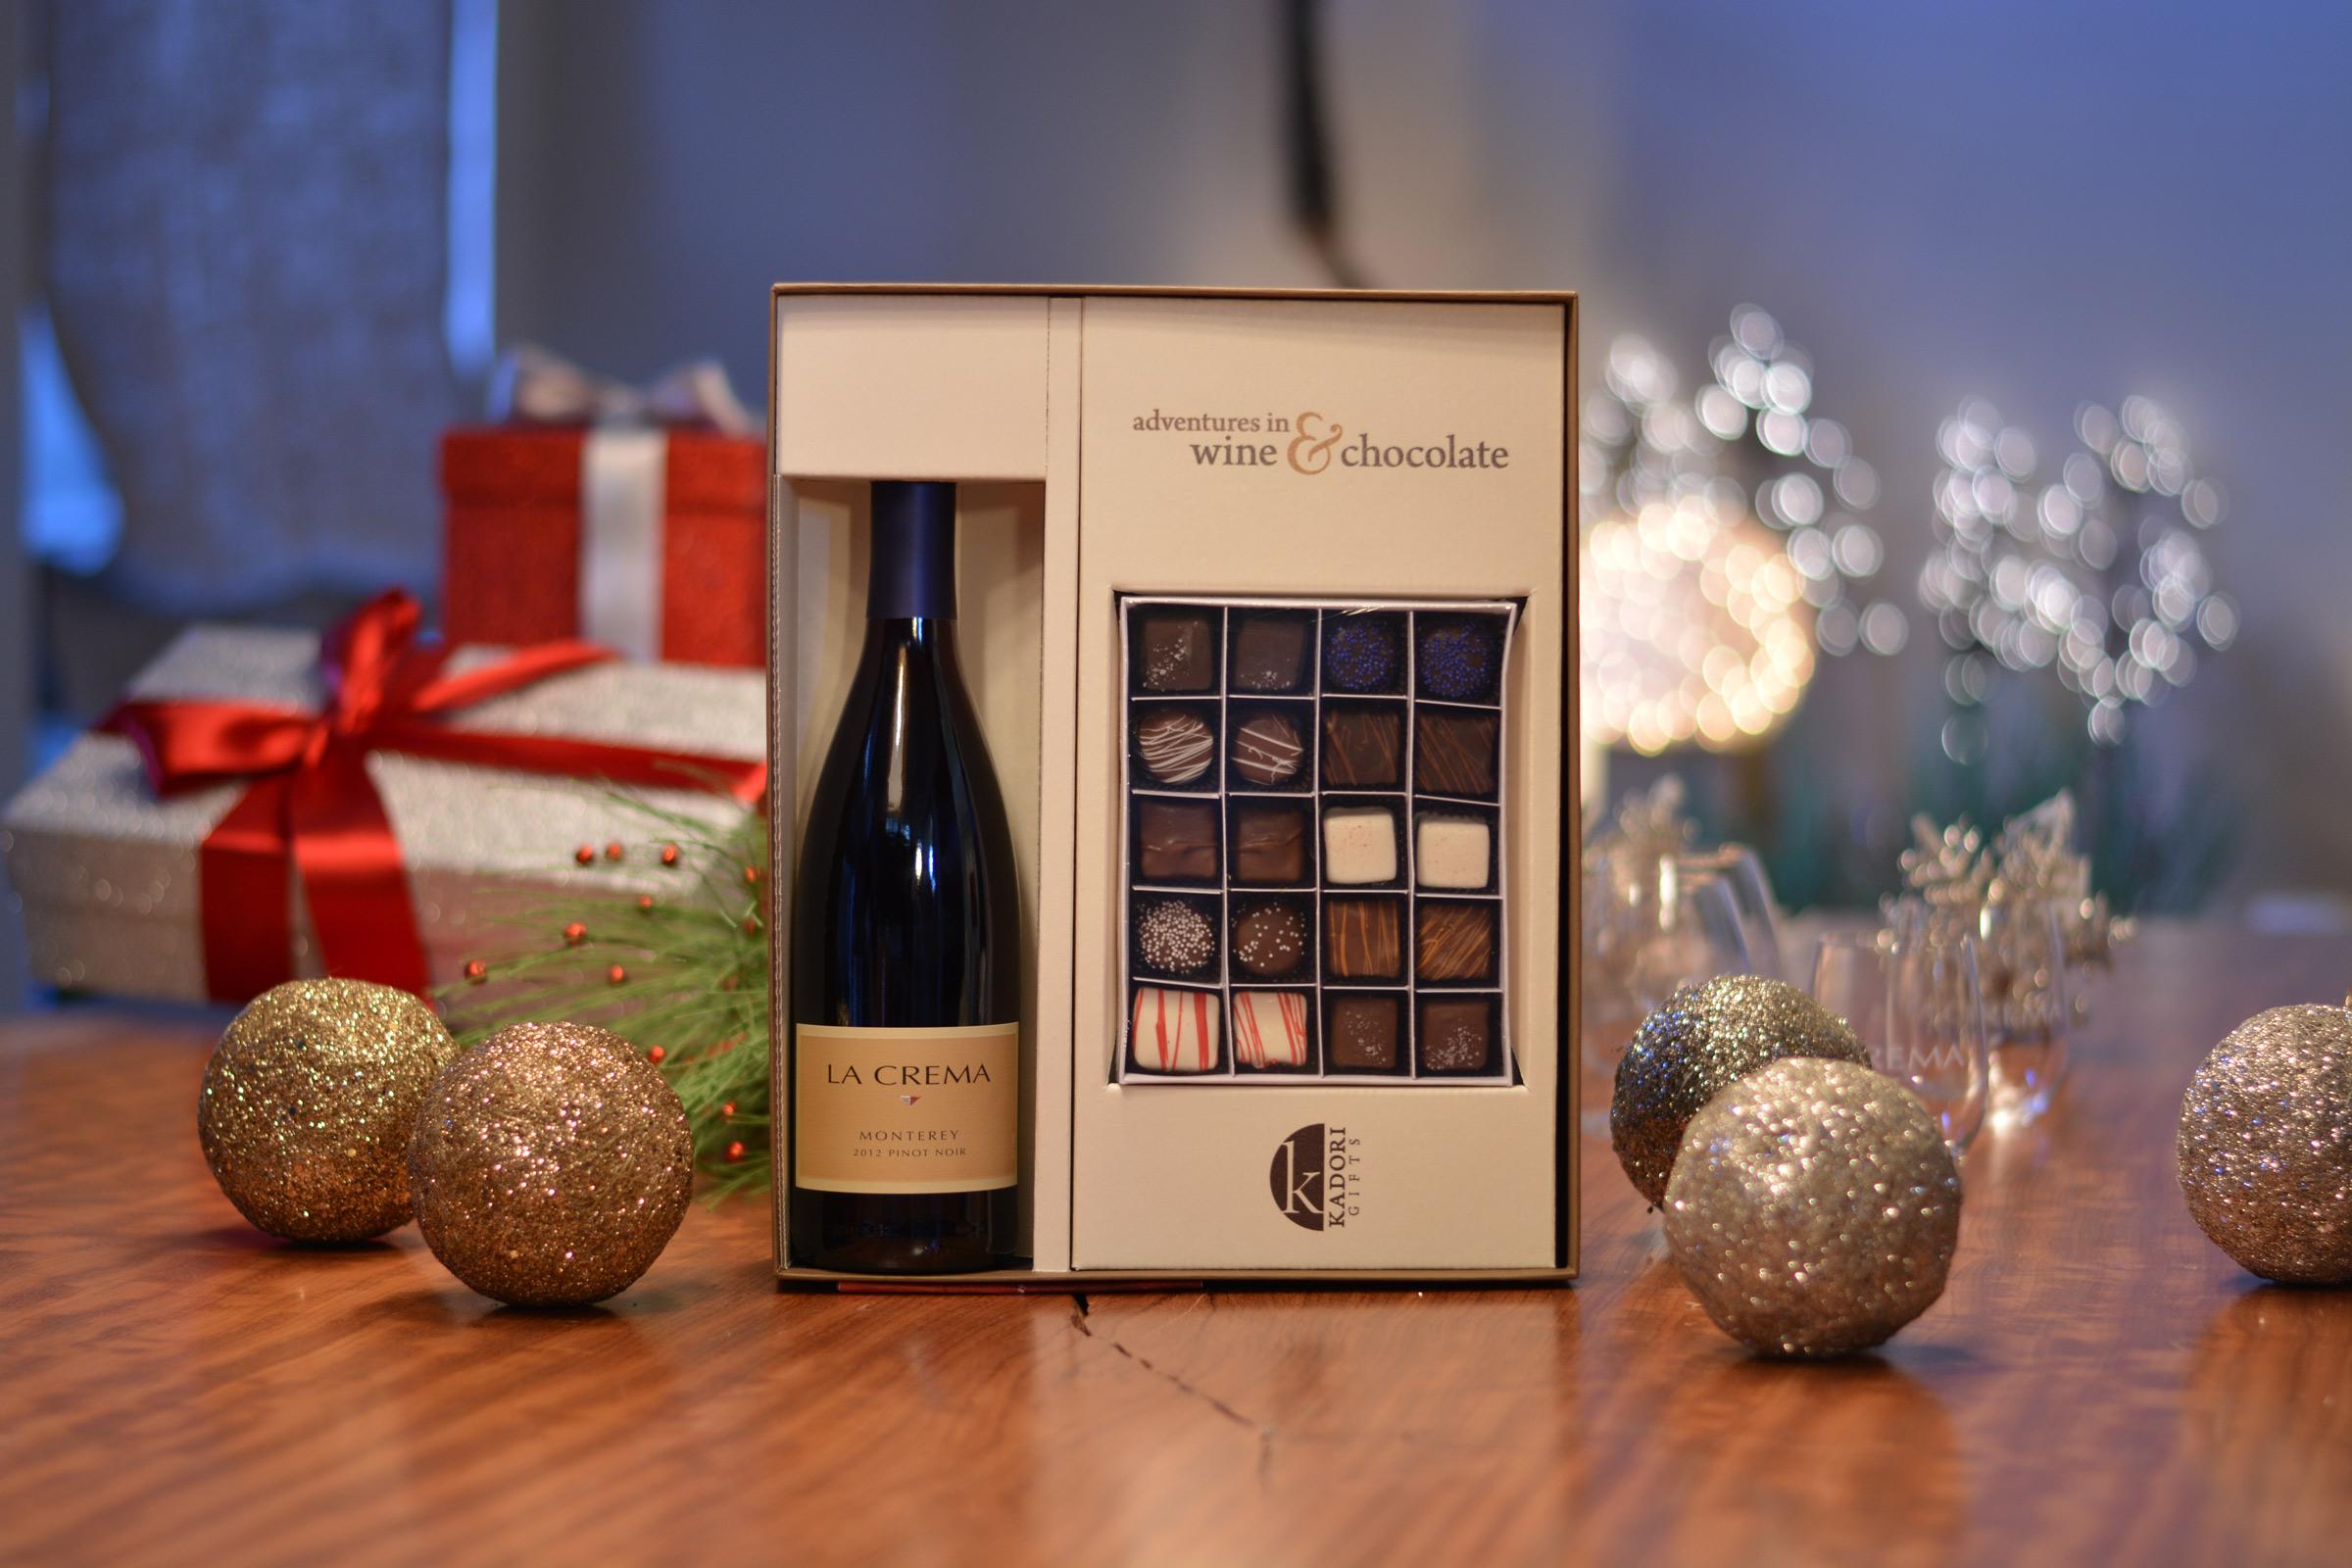 choco-lover-gift-set-beauty-shot